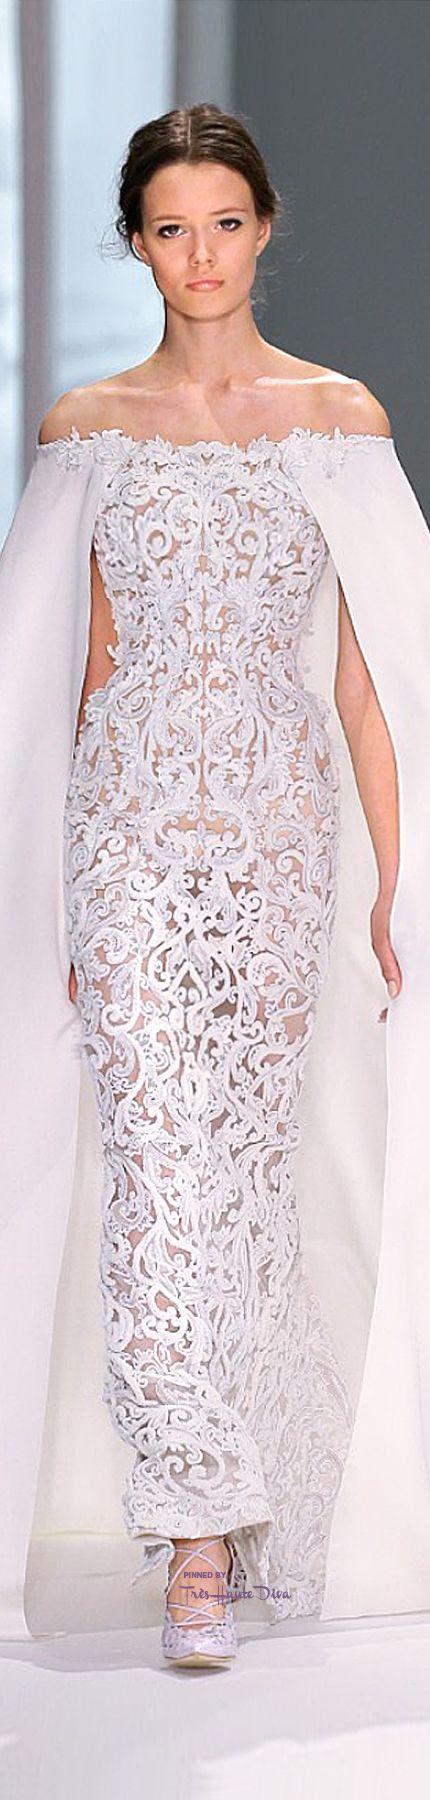 Ralph & Russo Spring 2015 Couture ♔THD♔ jαɢlαdy